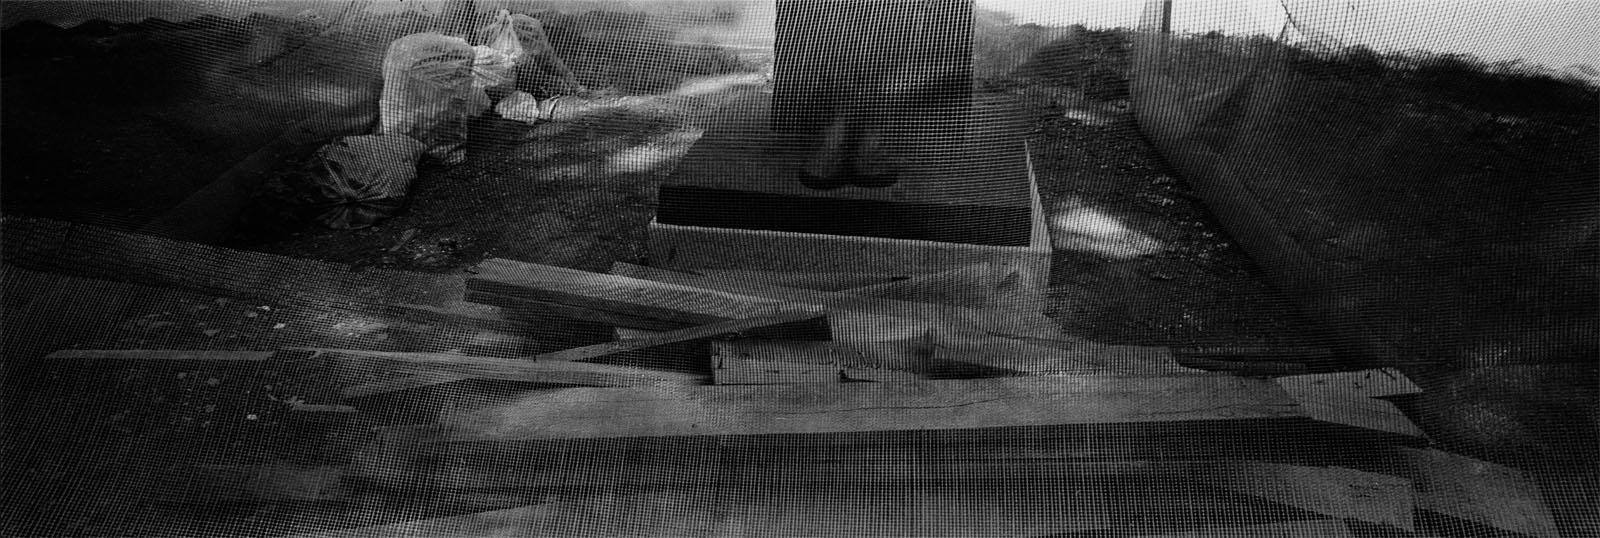 Art and Documentary Photography - Loading BGD___Fabio_Sgroi_027.jpg